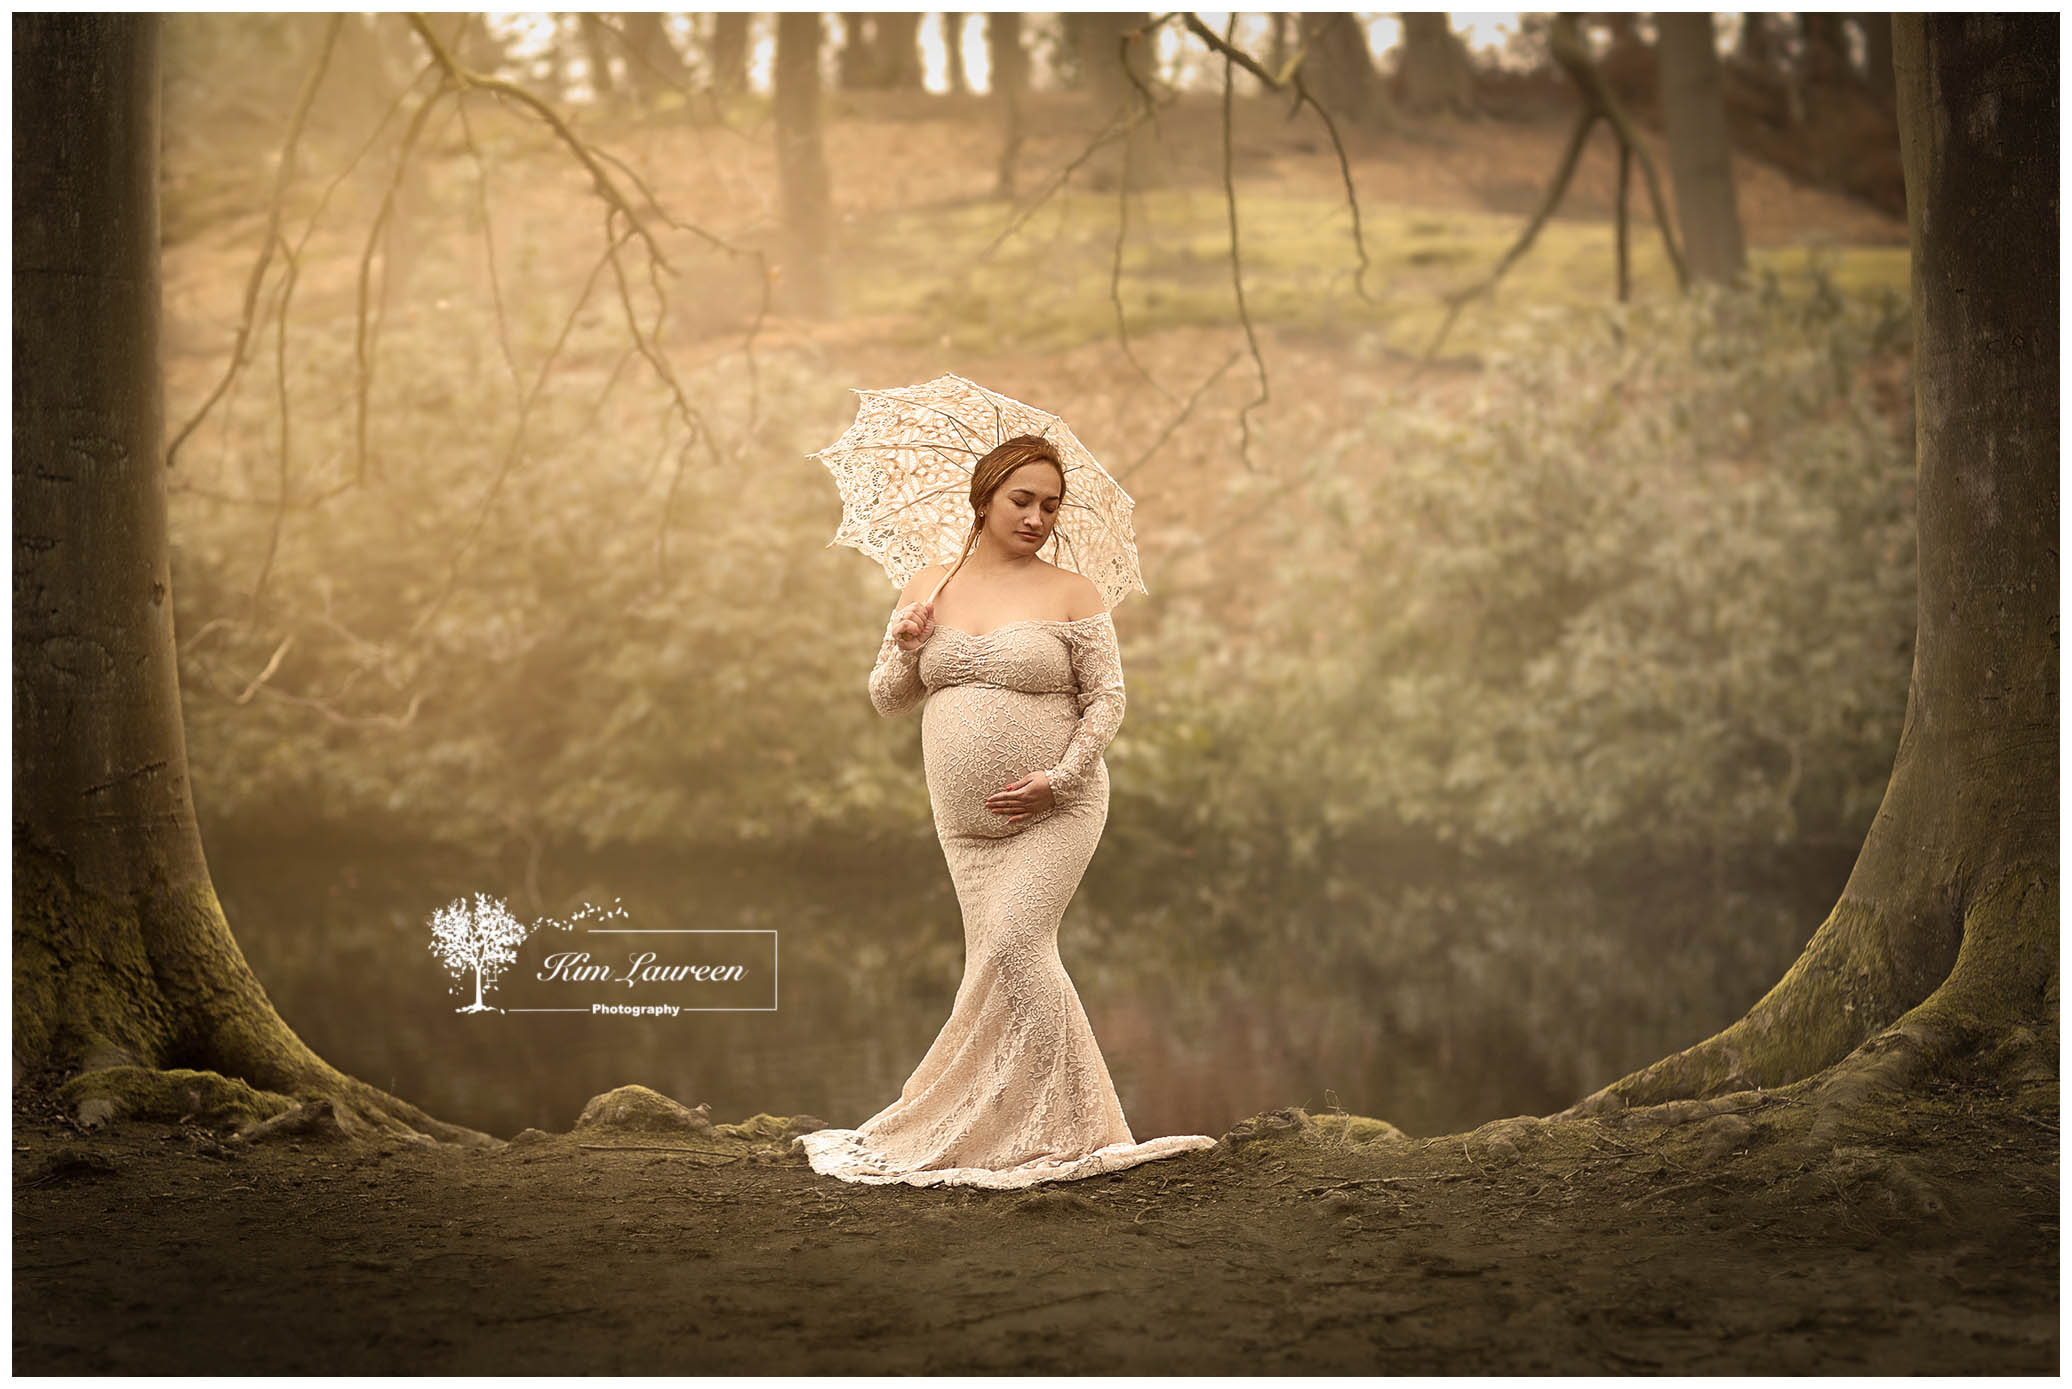 zwangerschap Kim Laureen